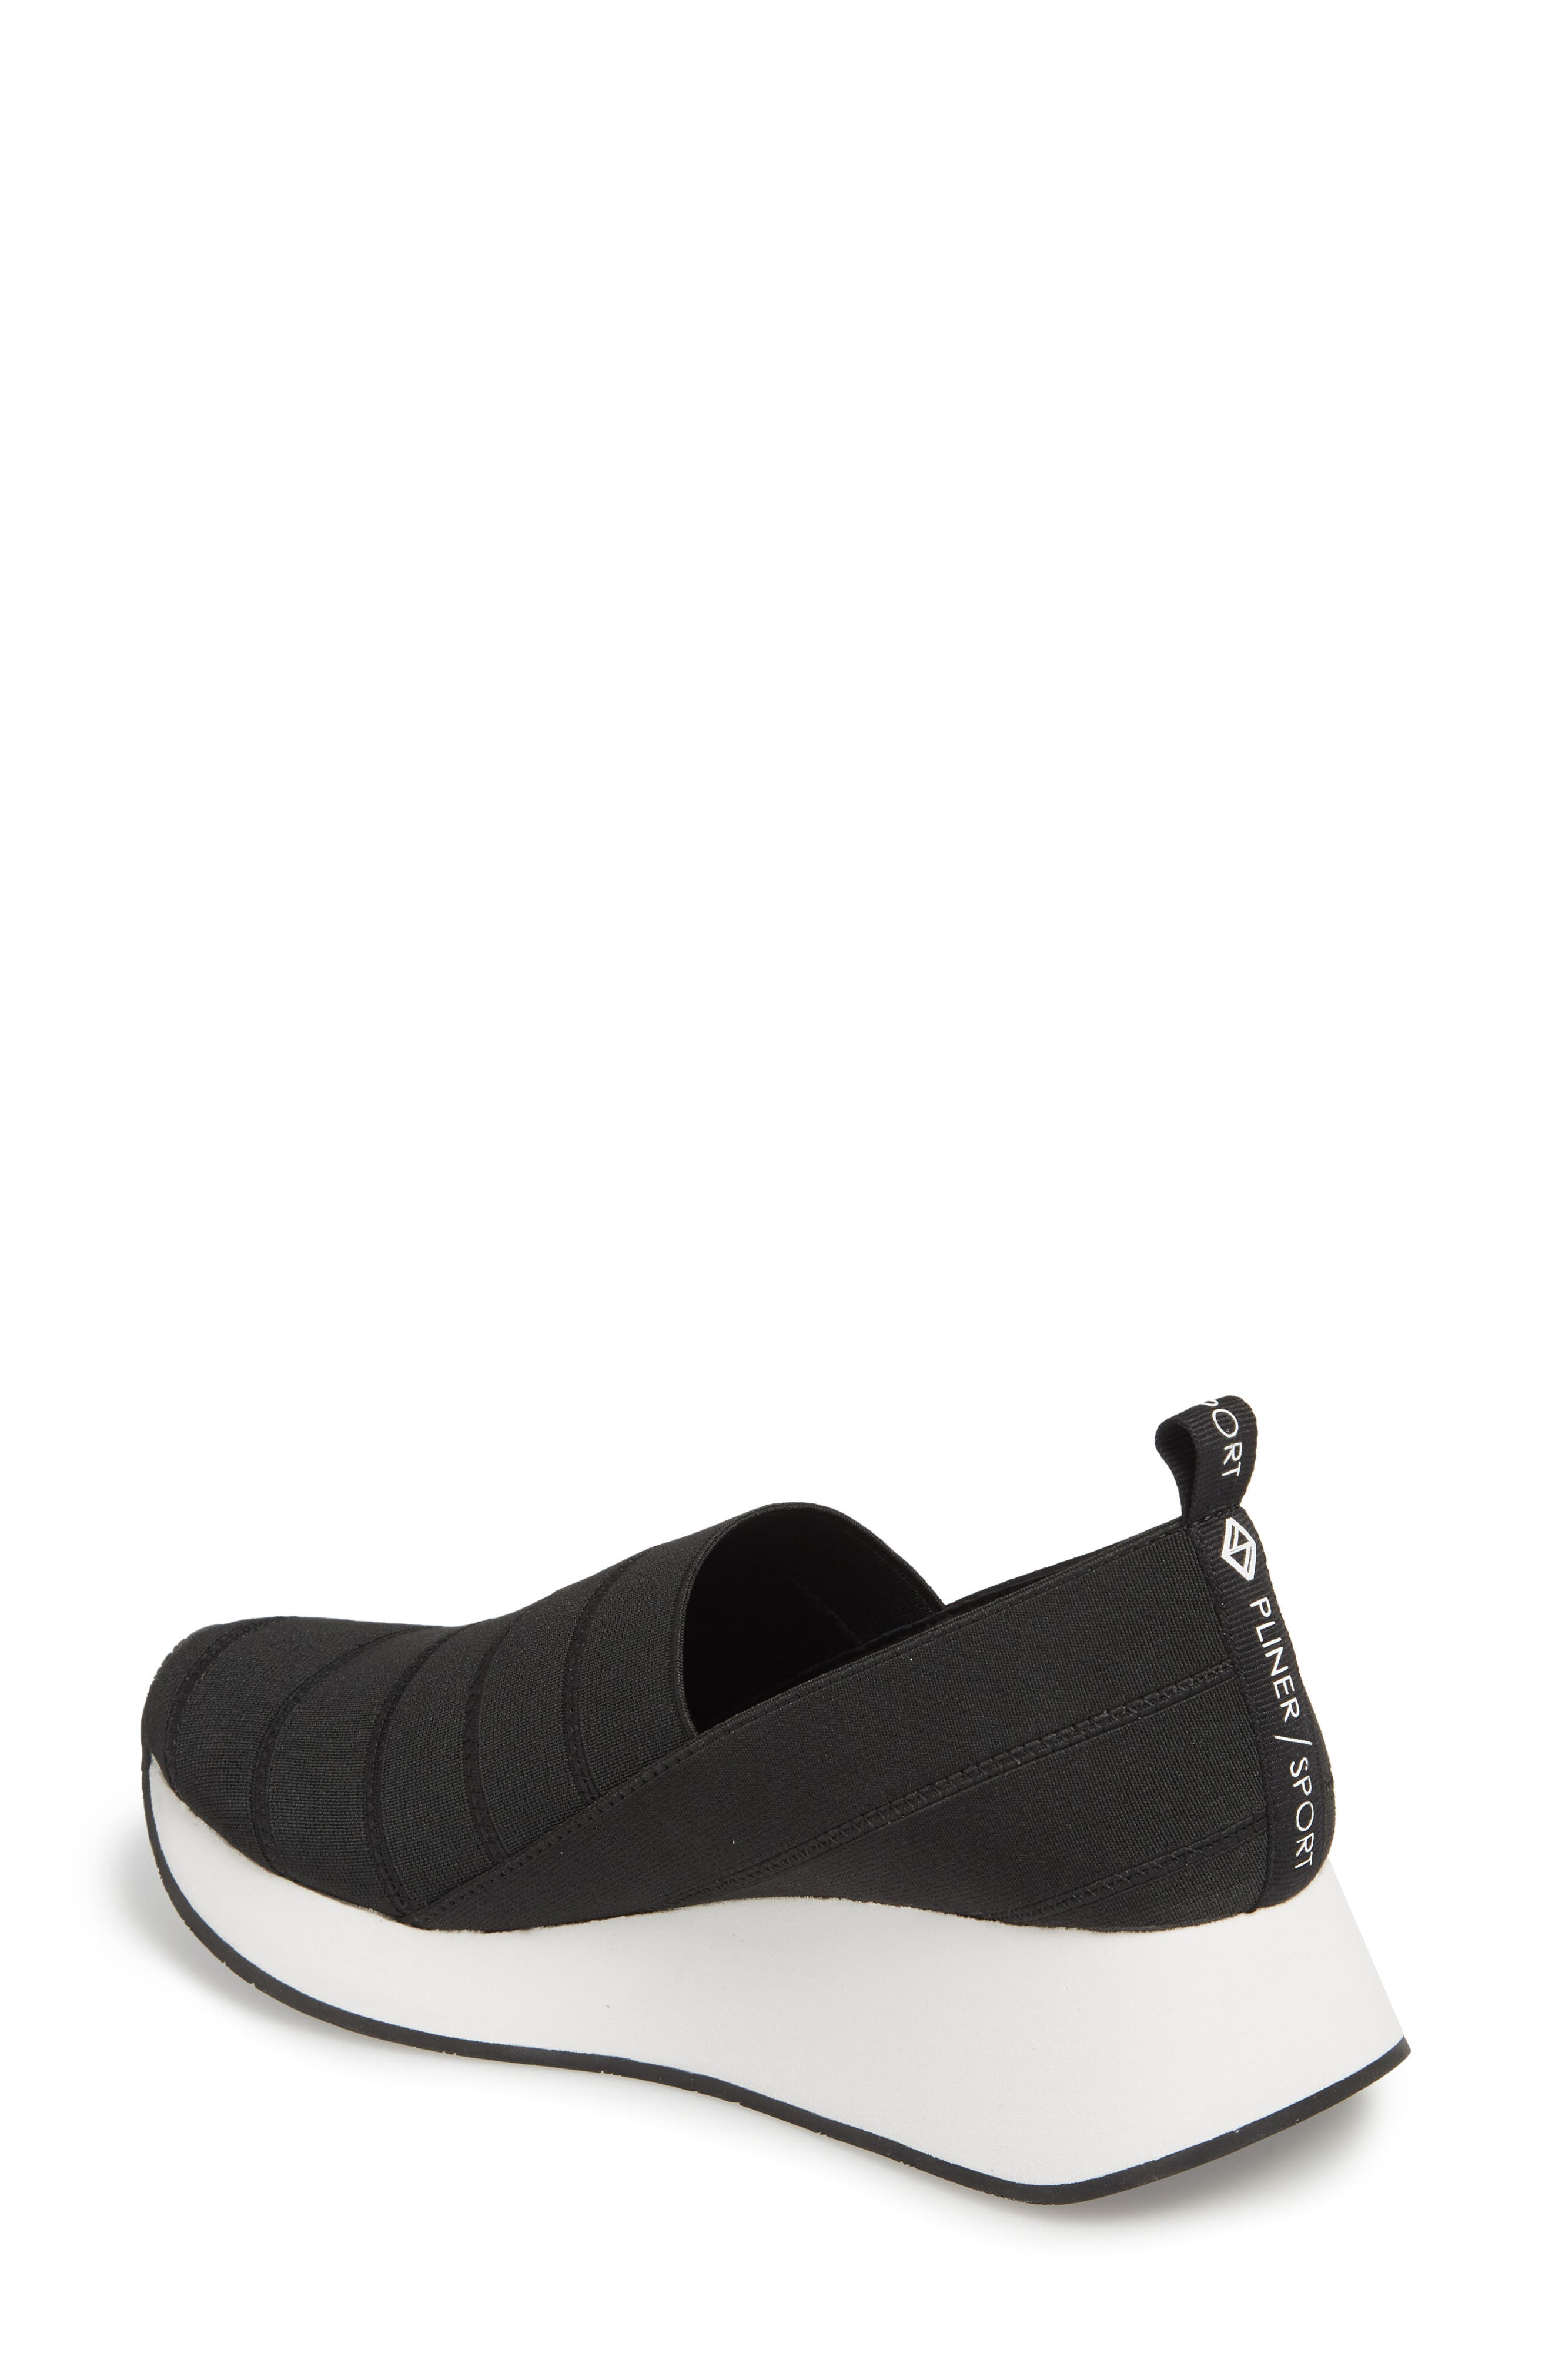 Piper Platform Slip-On Sneaker,                             Alternate thumbnail 2, color,                             BLACK STRETCH FABRIC